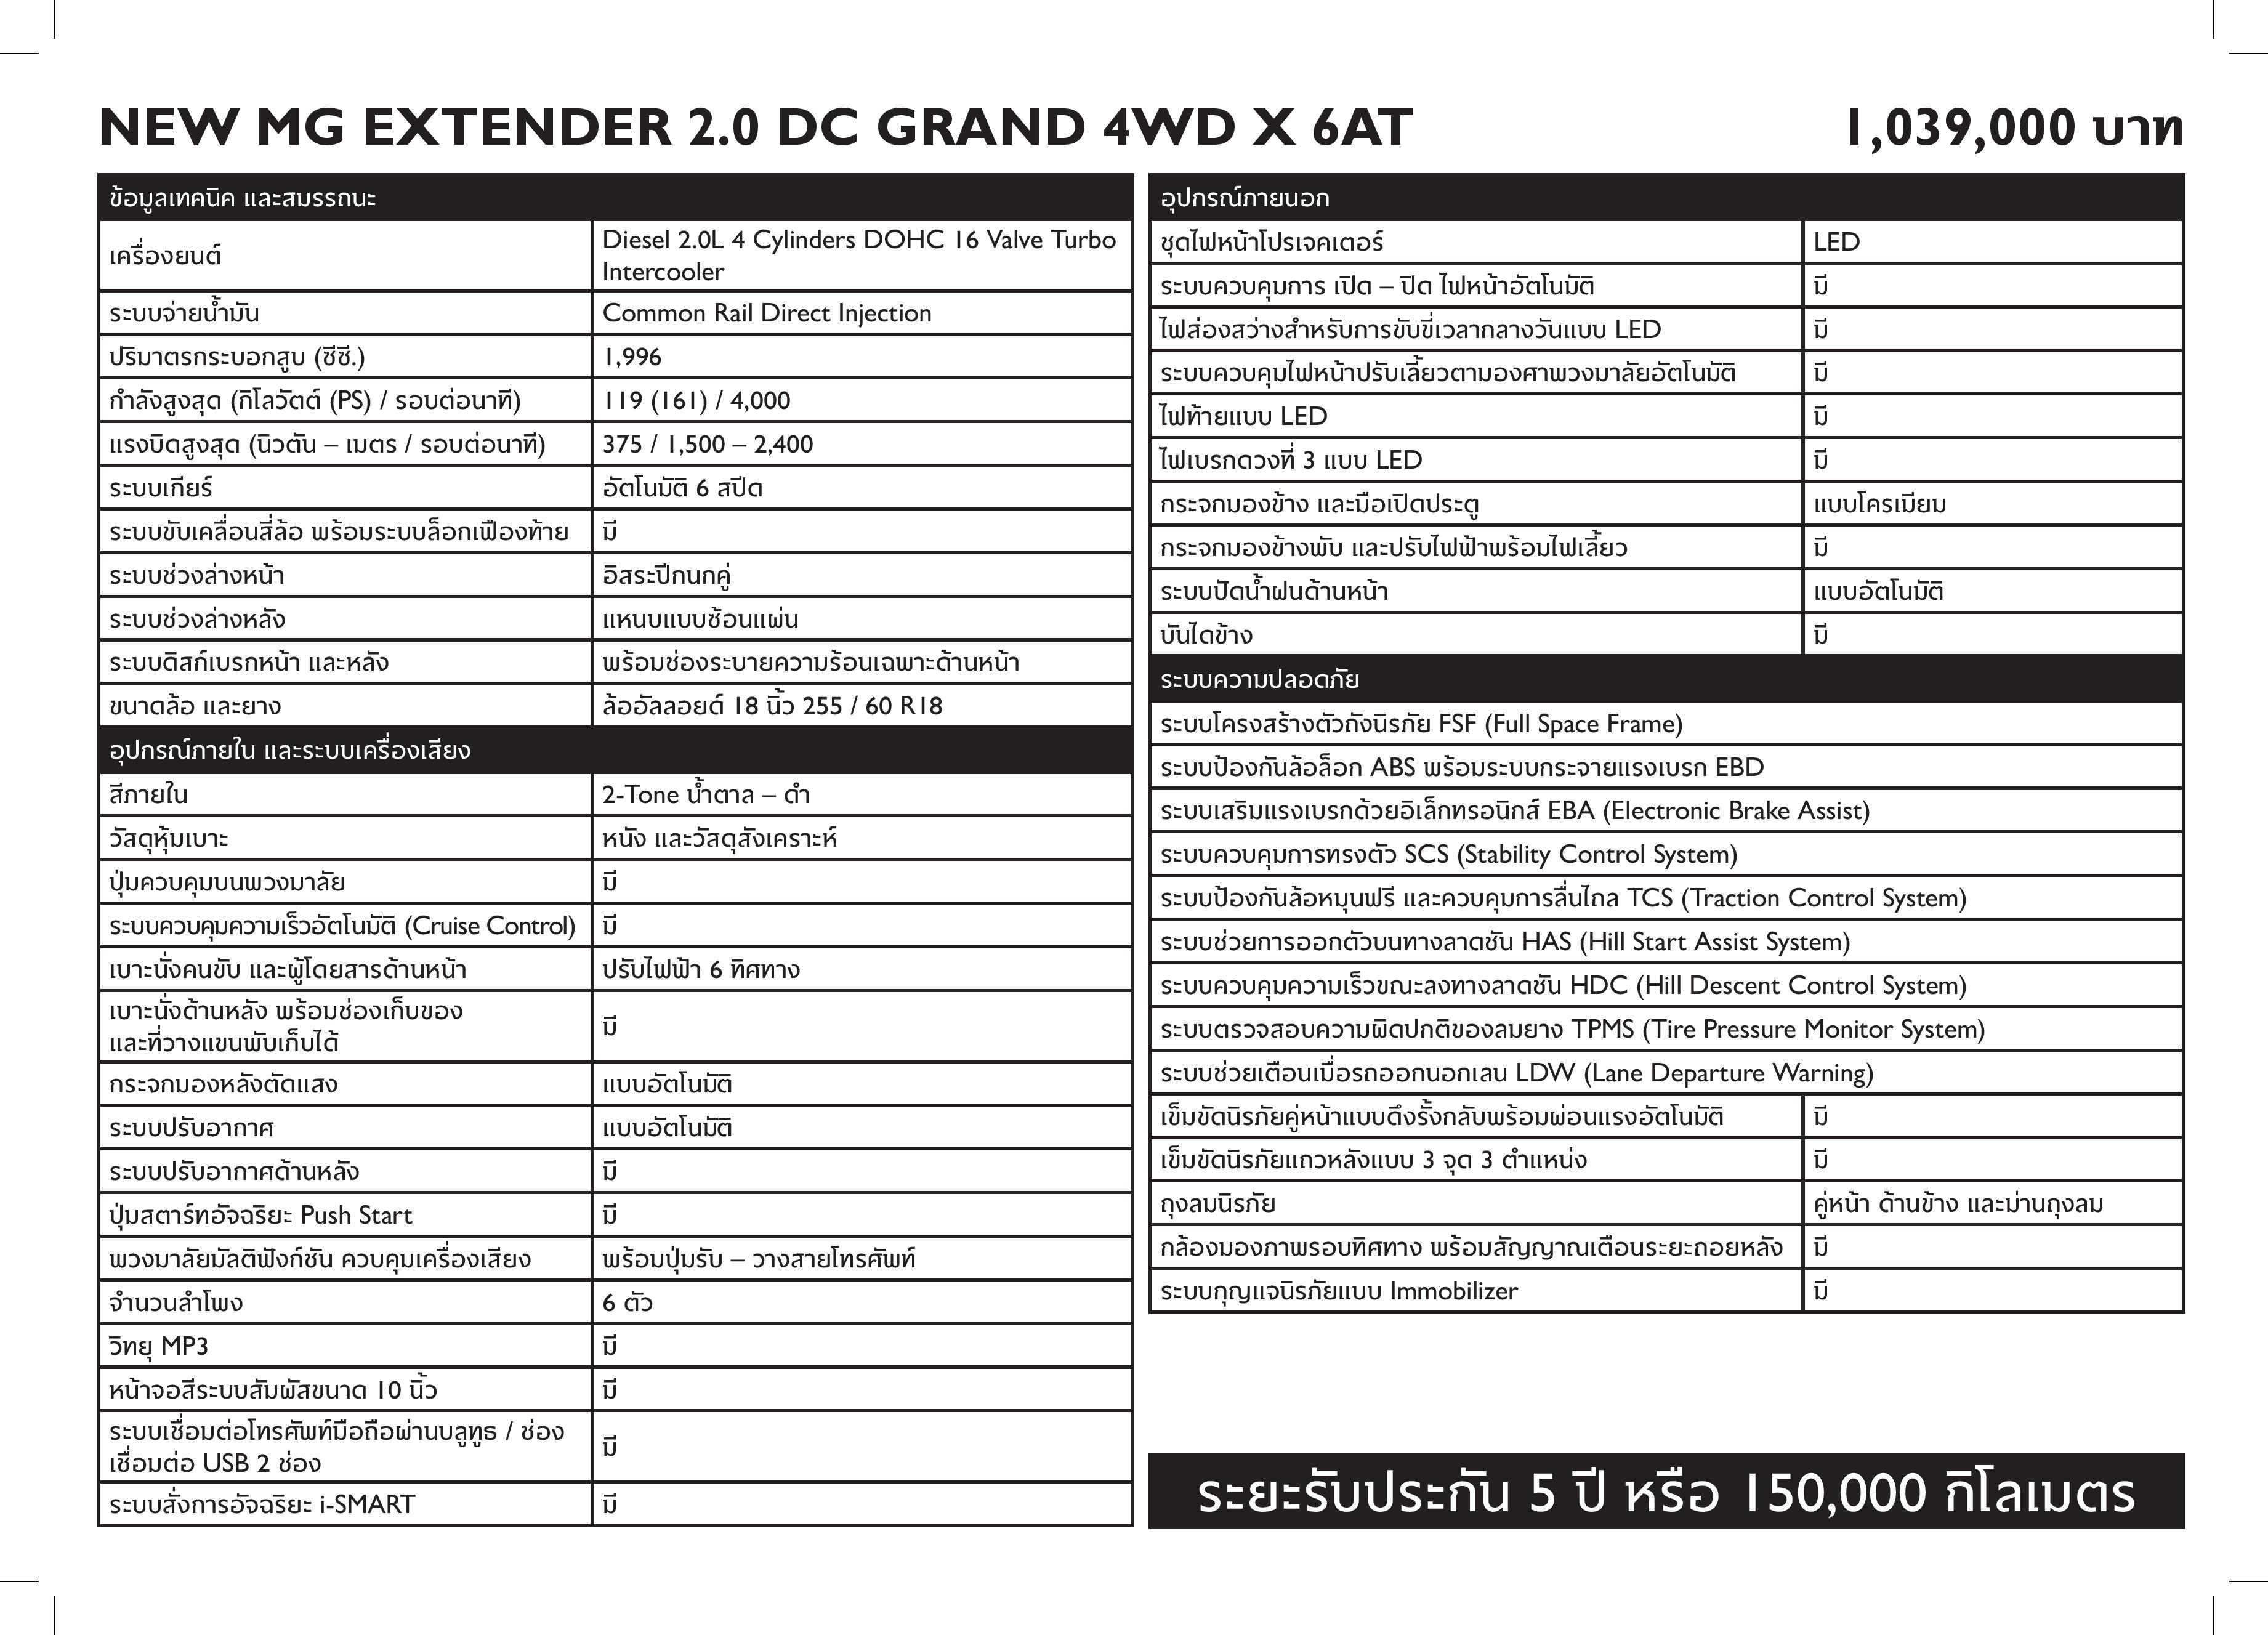 MG - NEW MG EXTENDER FL - Specsheet-page-001